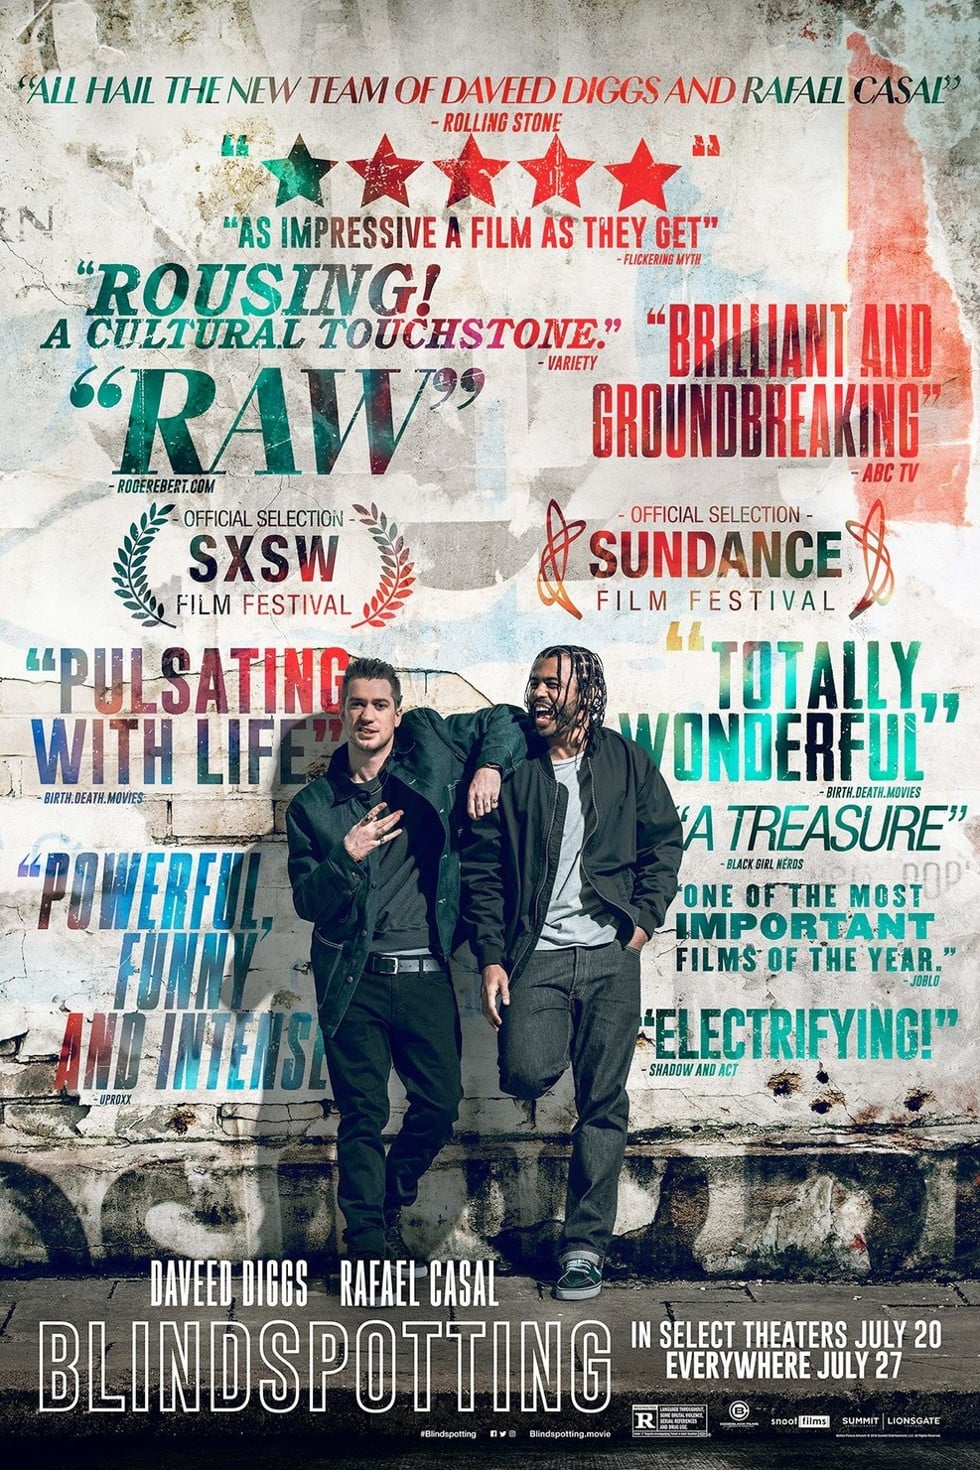 Poster and image movie Film Blindspotting - Blindspotting 2018